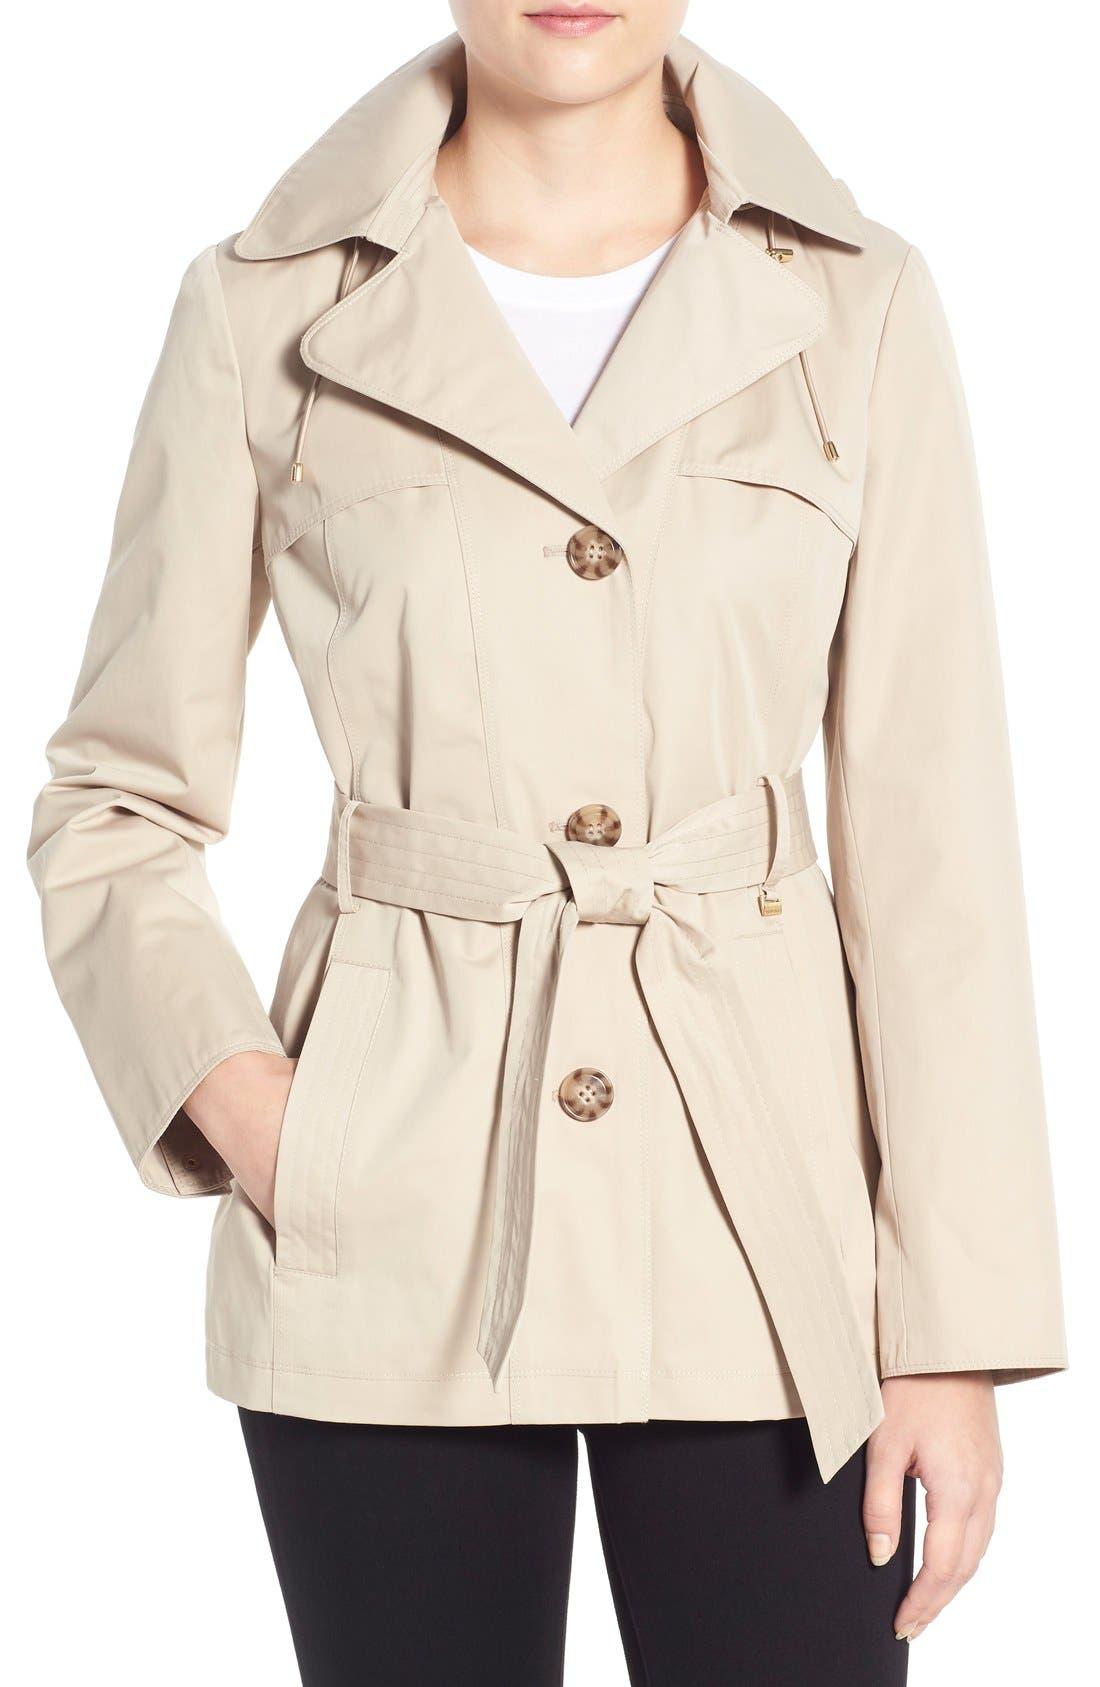 Cotton Blend Short Trench Coat,                             Main thumbnail 1, color,                             Sand